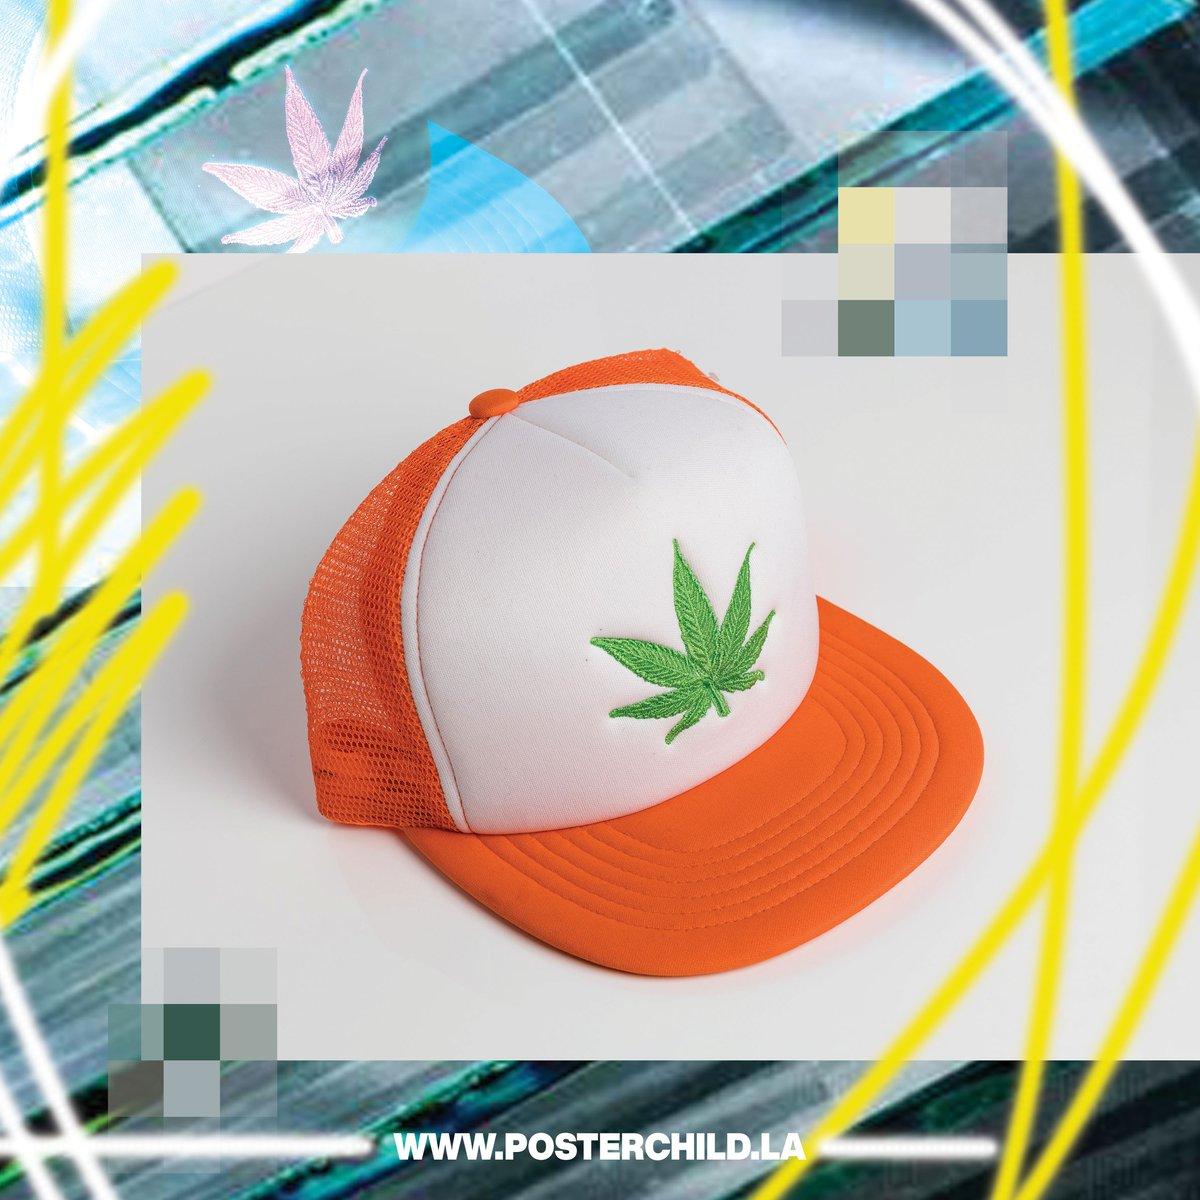 420 Trucker hat